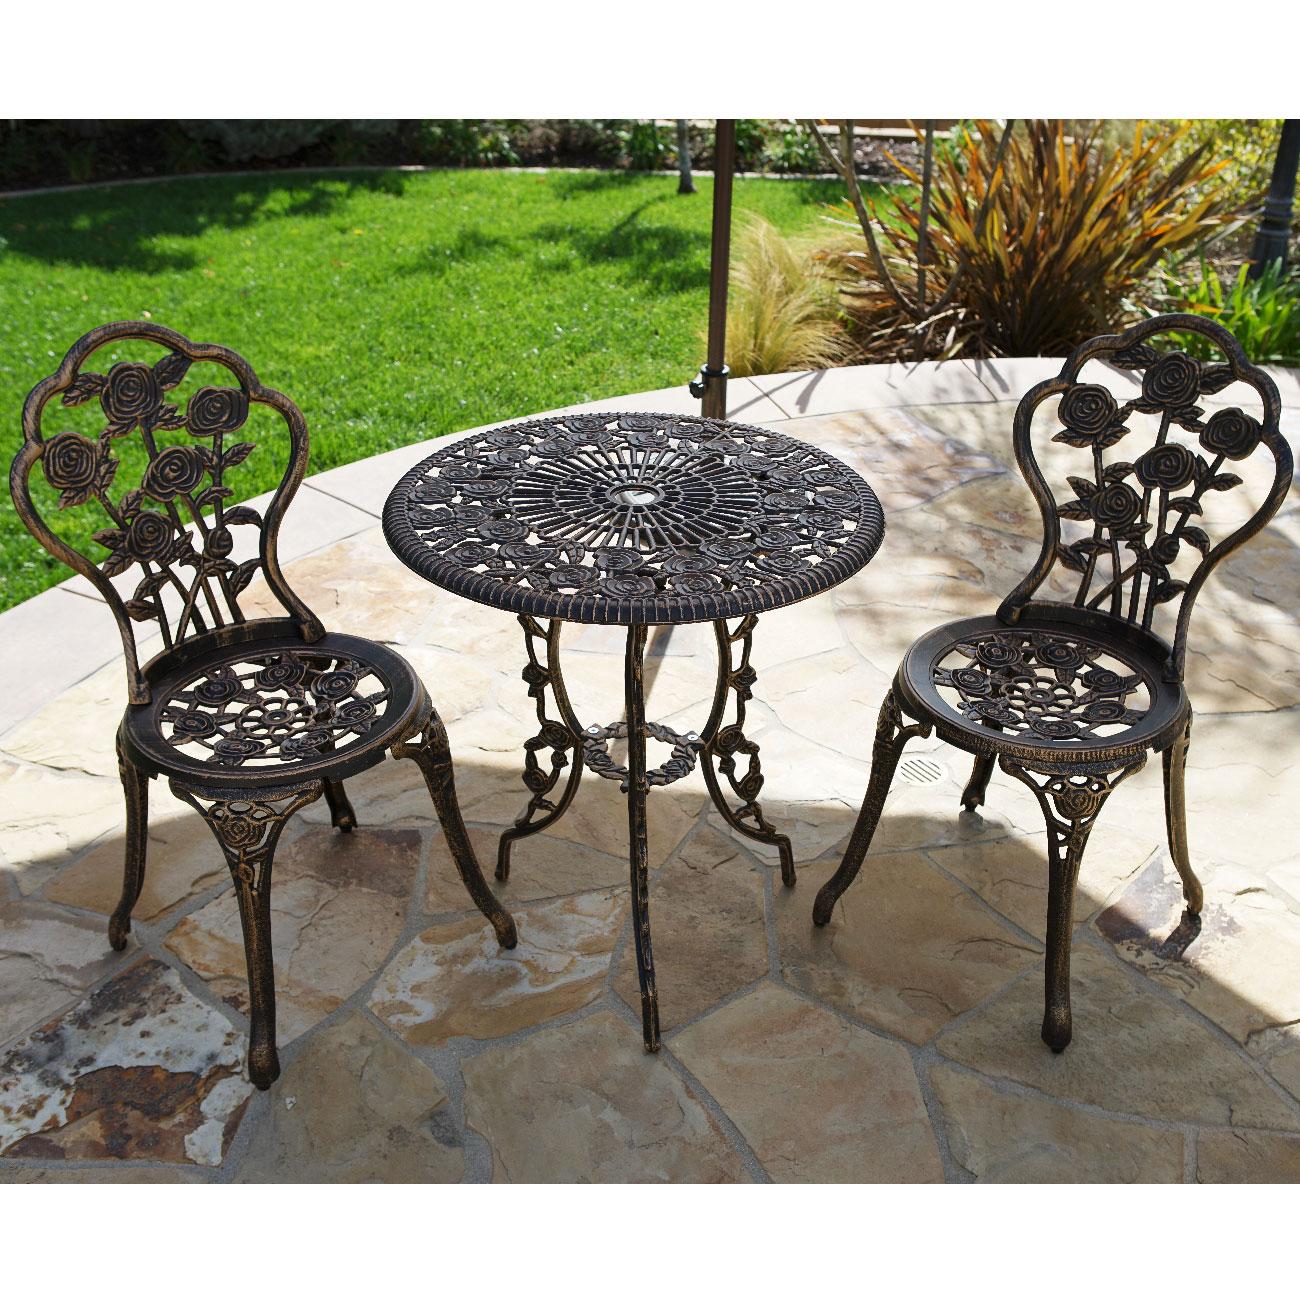 Outdoor Patio Furniture Aluminum Frame: Outdoor Patio Furniture Cast Aluminum Tulip Design Bistro